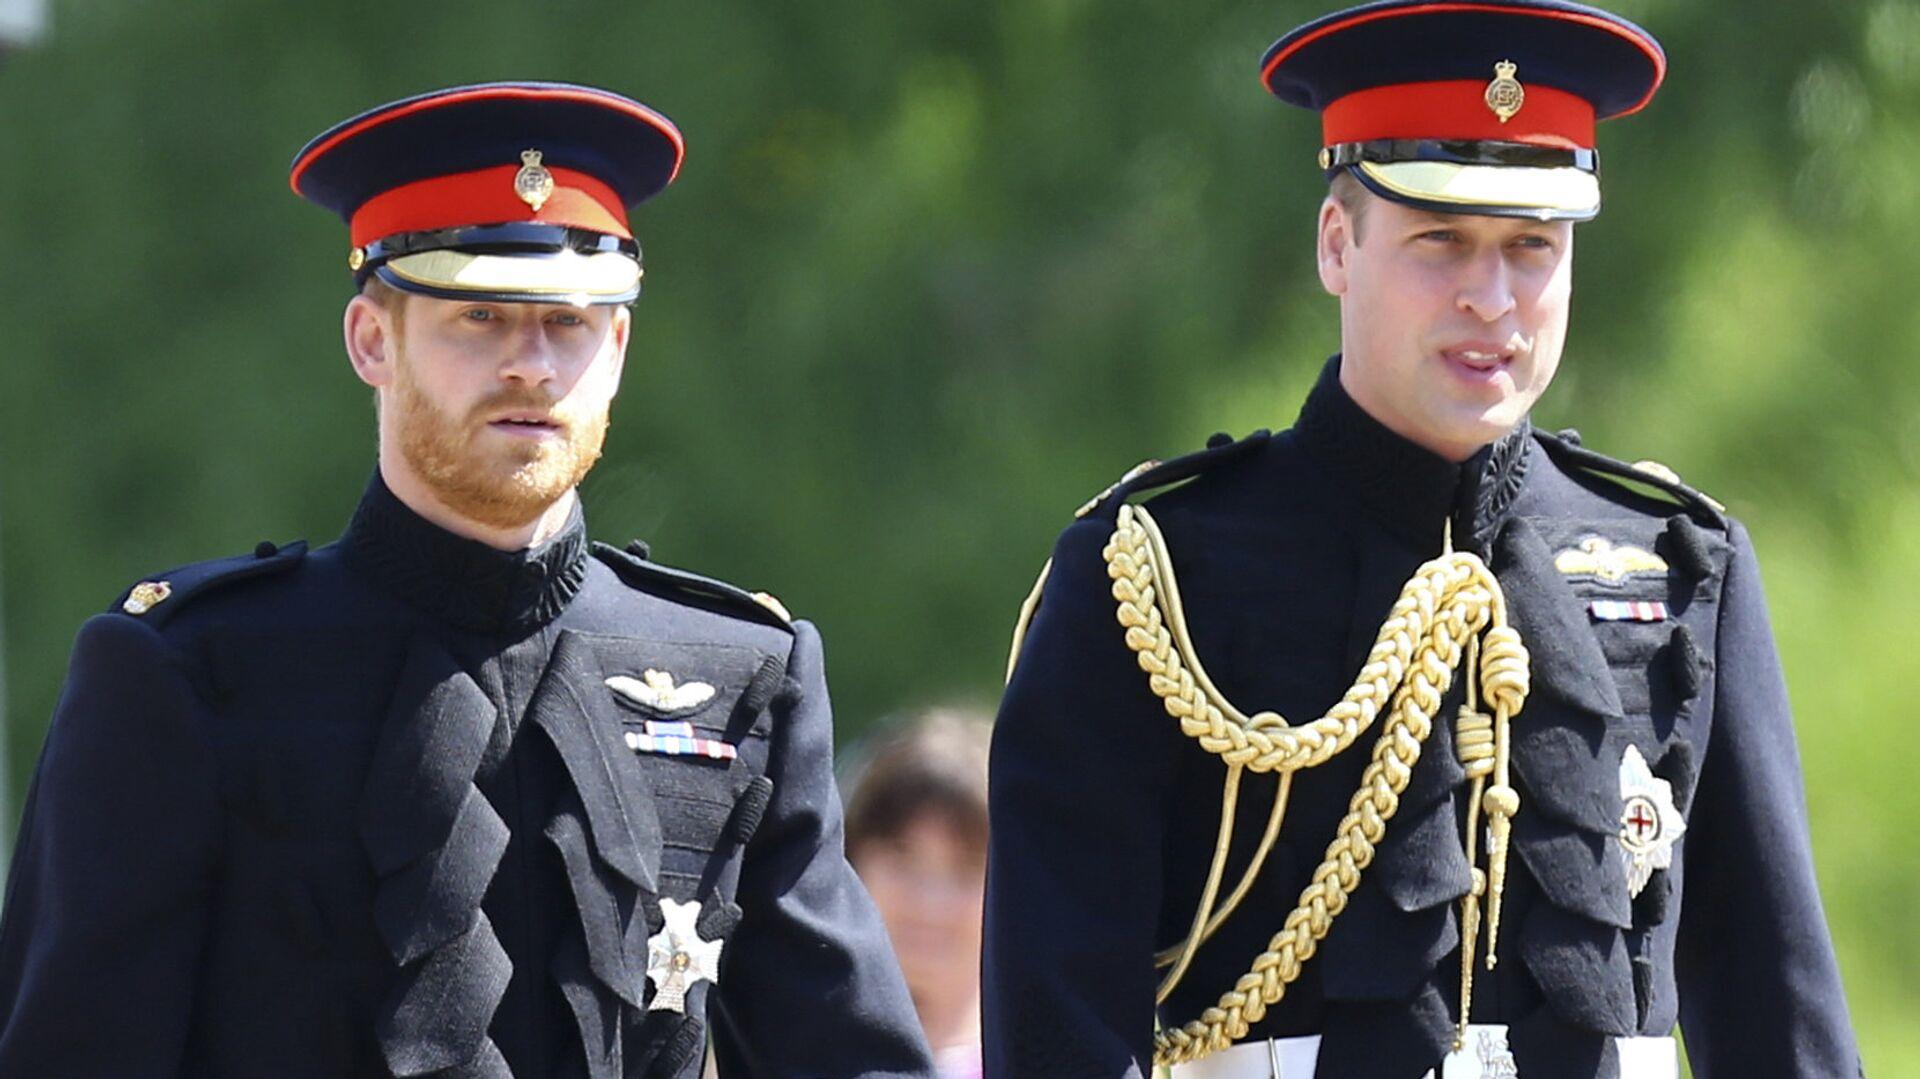 Principe Harry e principe William - Sputnik Italia, 1920, 30.05.2021